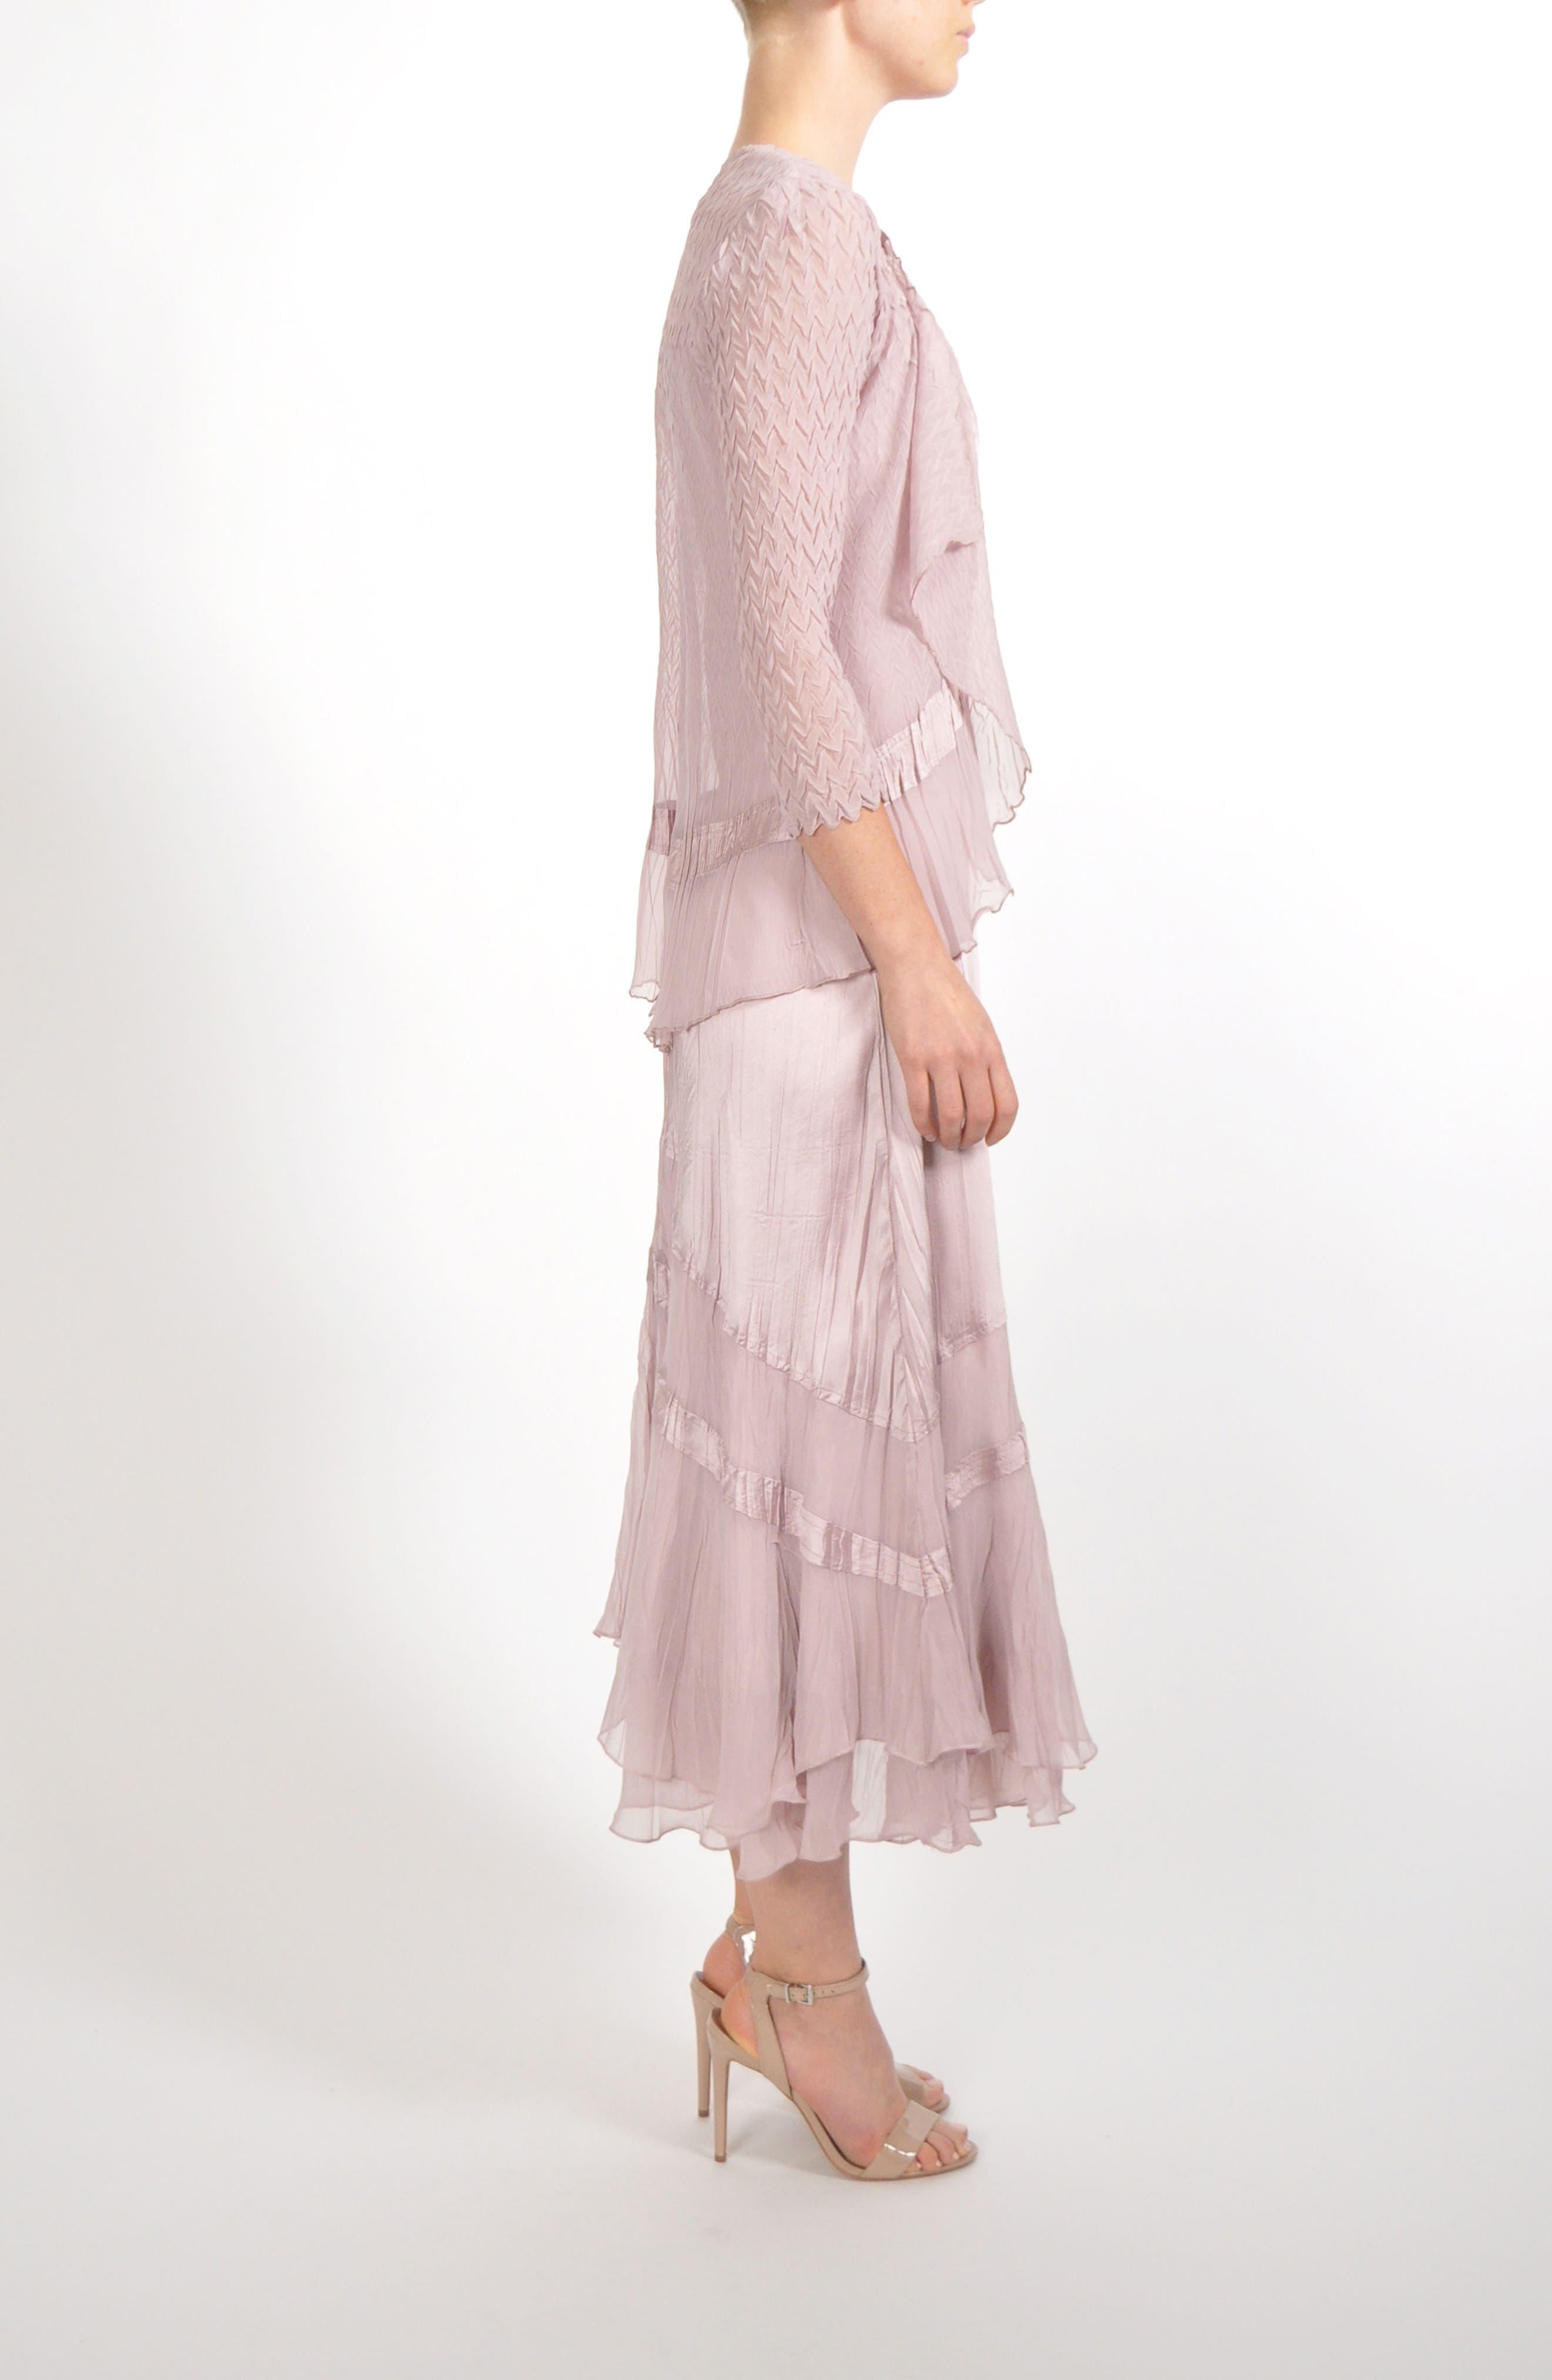 Embellished Tiered Hem Dress With Jacket,                             Alternate thumbnail 6, color,                             030